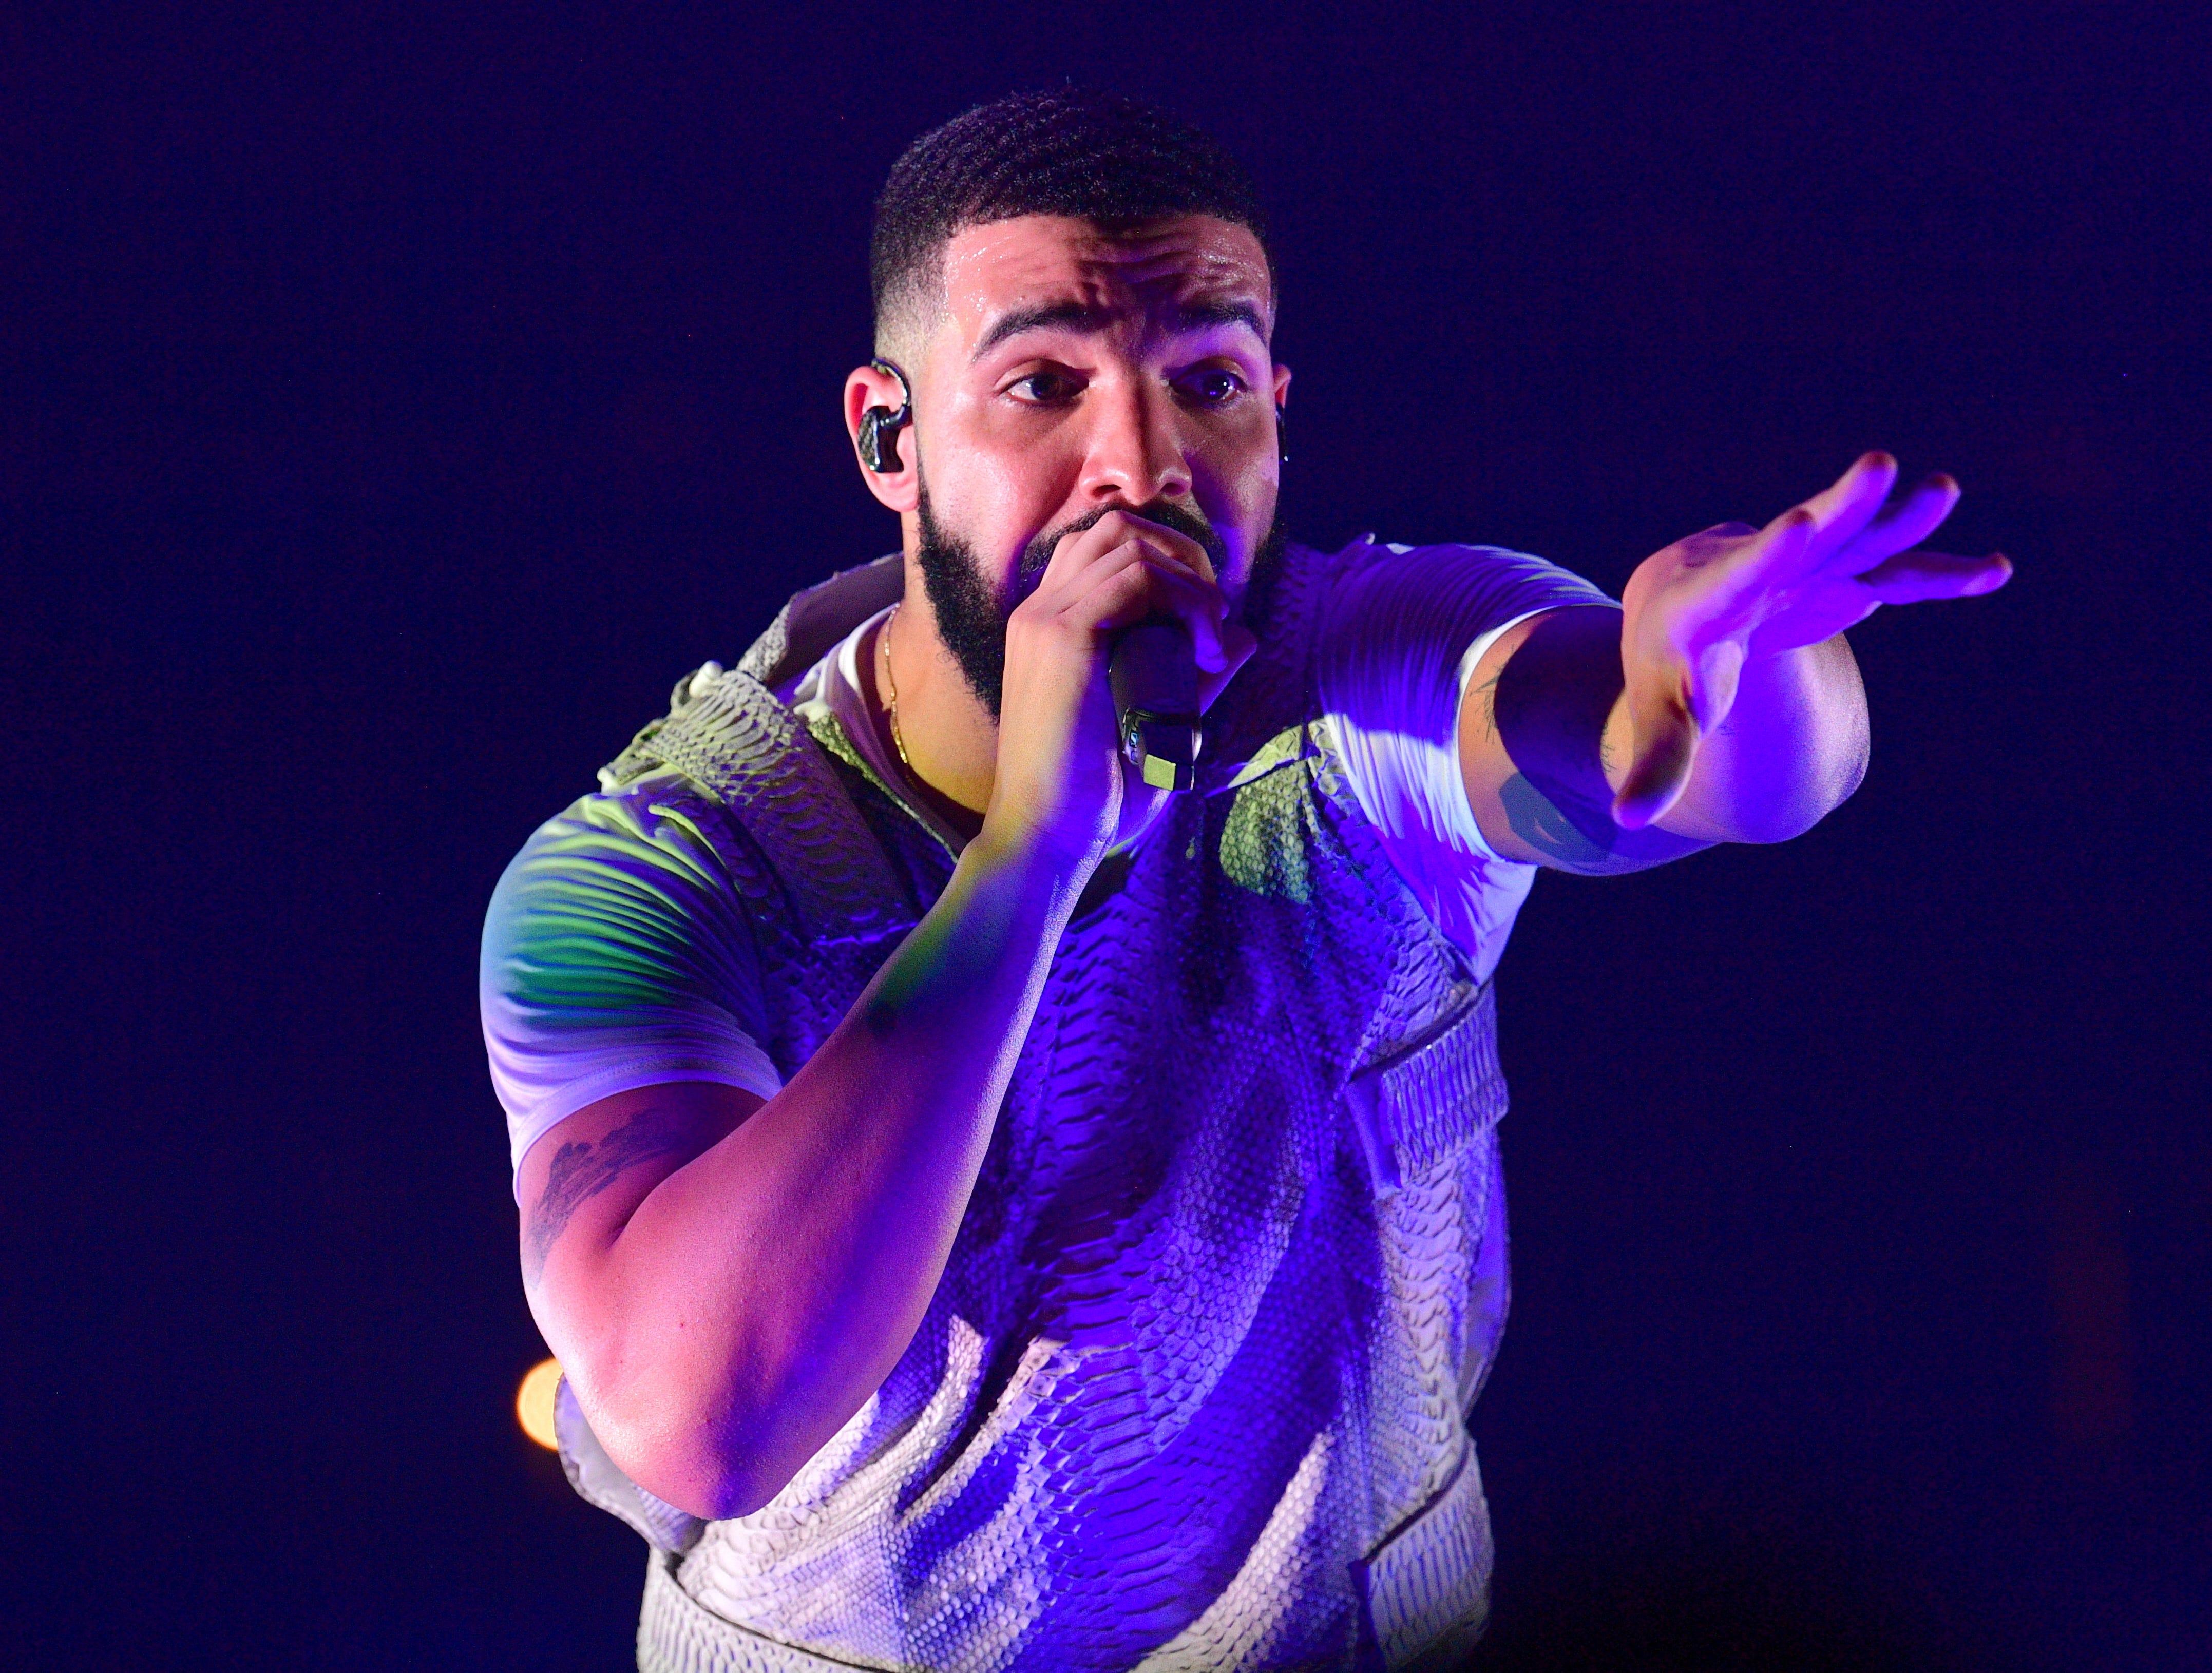 ATLANTA, GA - NOVEMBER 18: Drake performs onstage during the Final Stop of 'Aubrey & The three Amigos Tour' at State Farm Arena on November 18, 2018 in Atlanta, Georgia.(Photo by Prince Williams/Wireimage) ORG XMIT: 775260230 ORIG FILE ID: 1069779584